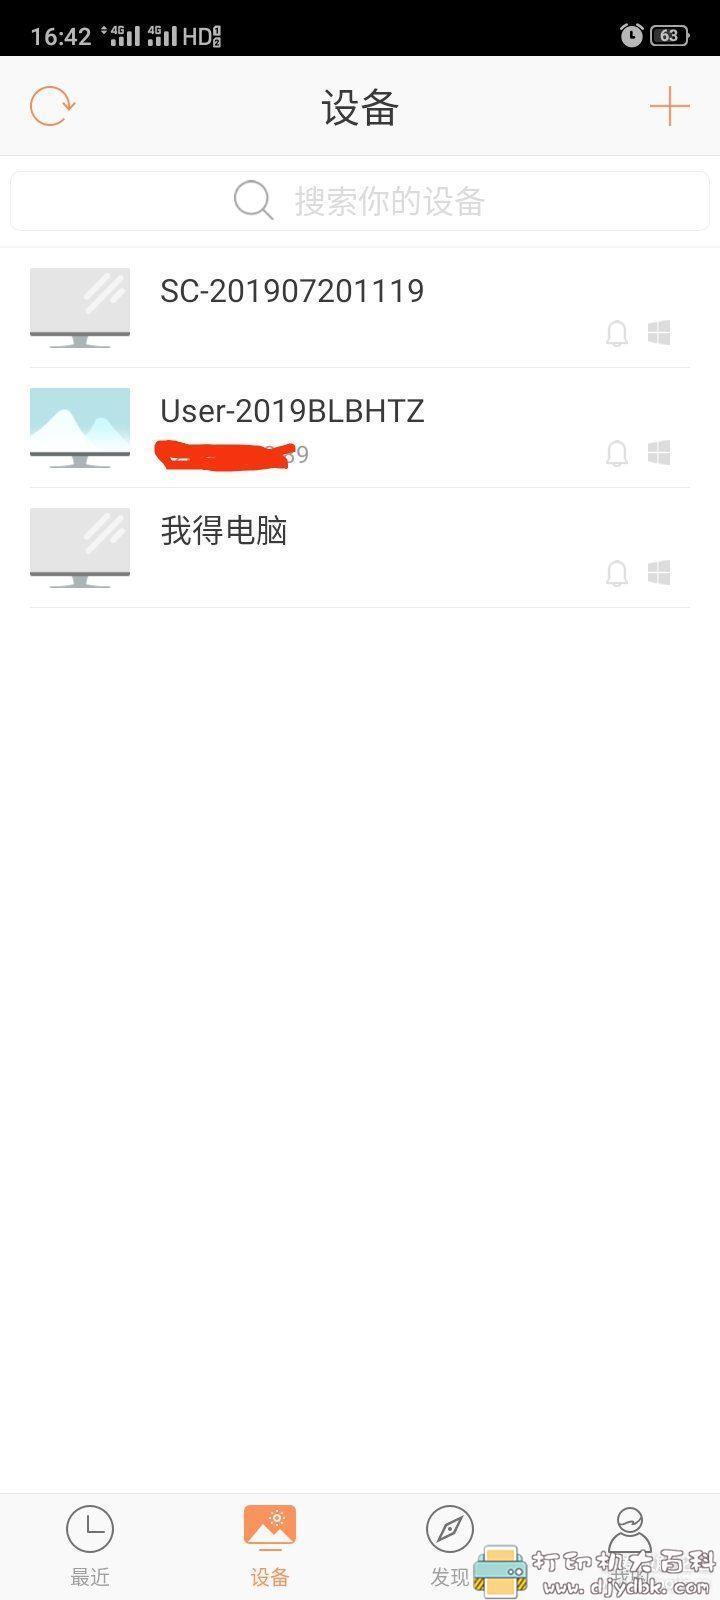 [Android]可手机控制电脑的 安卓向日葵APK-吾爱尊享版图片 No.1